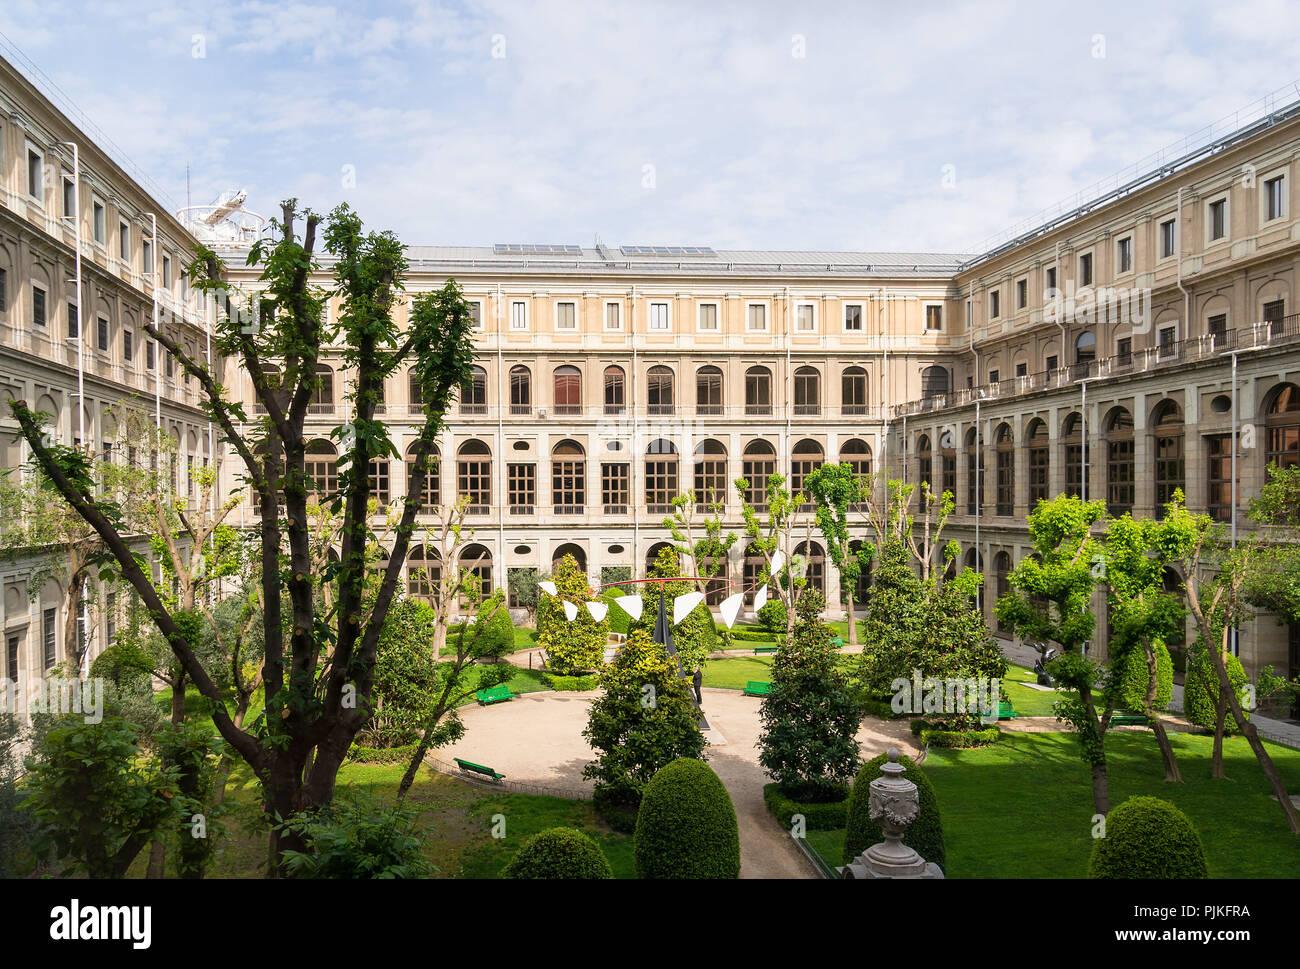 Museo Reina Sofia.Madrid Museo Reina Sofia Courtyard Stock Photo 218017726 Alamy